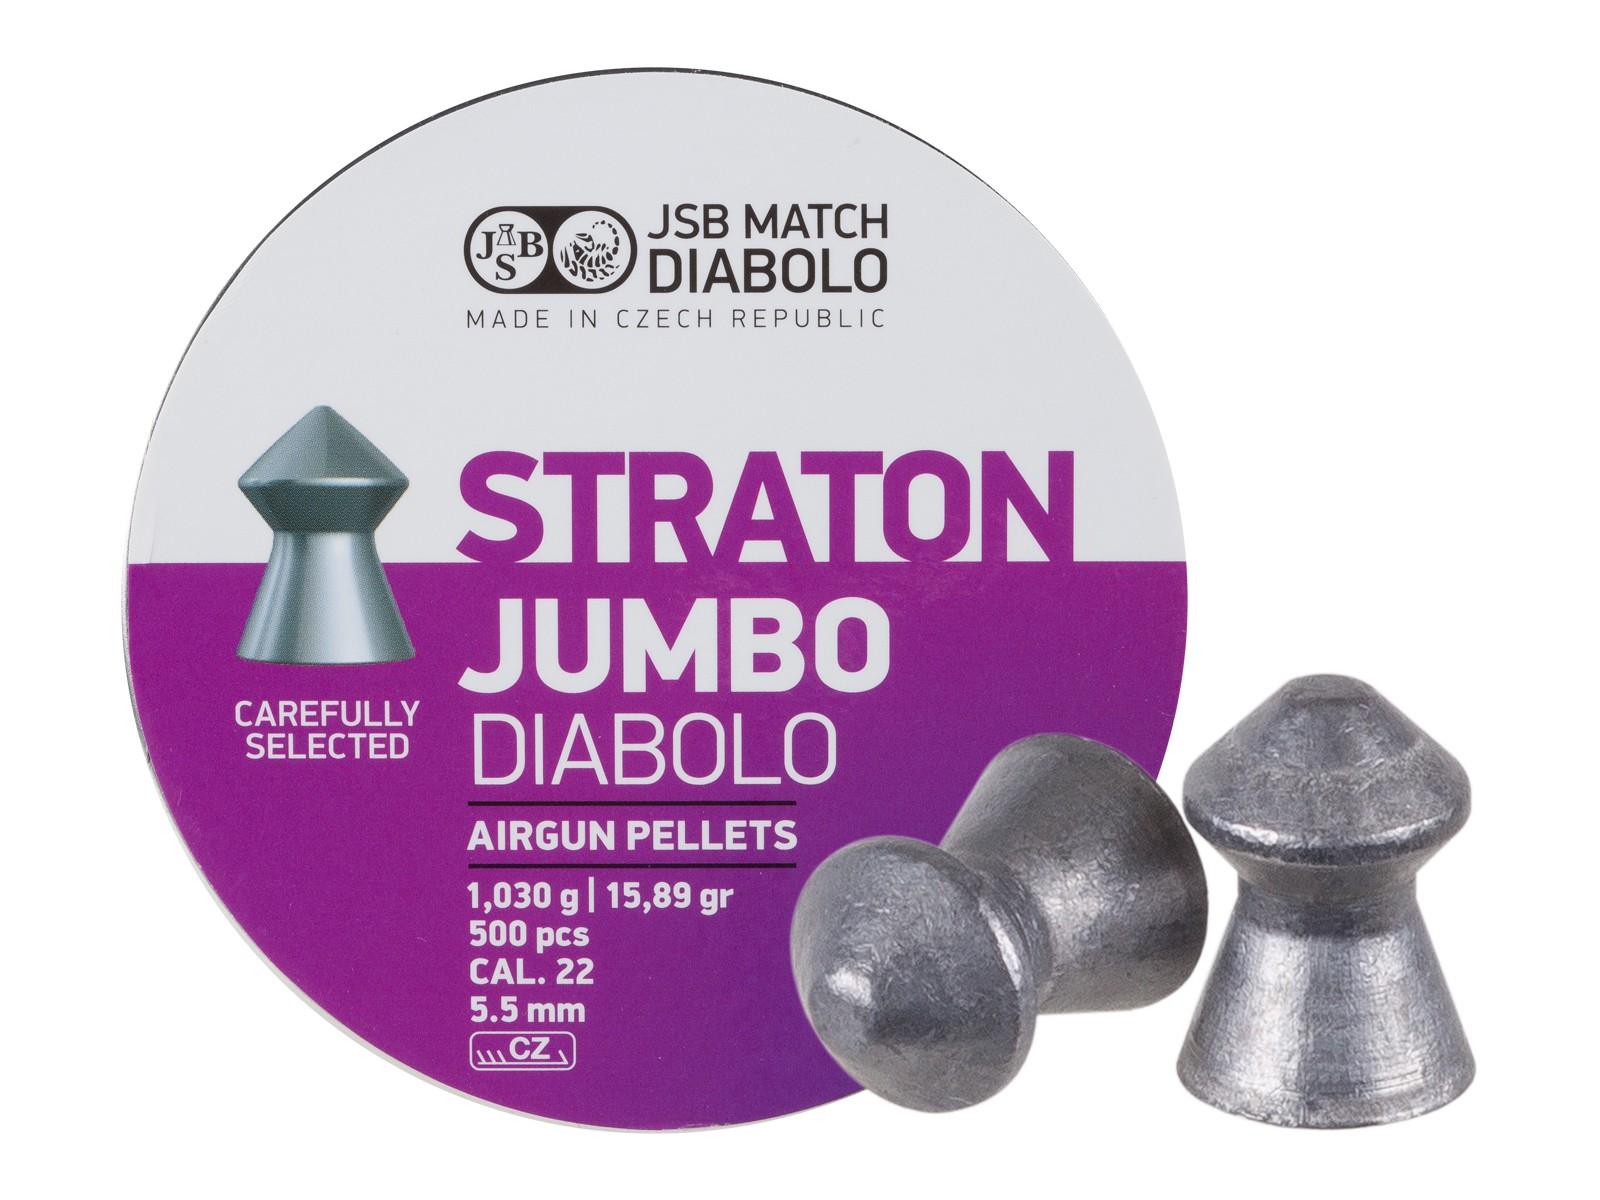 JSB Diabolo Jumbo.